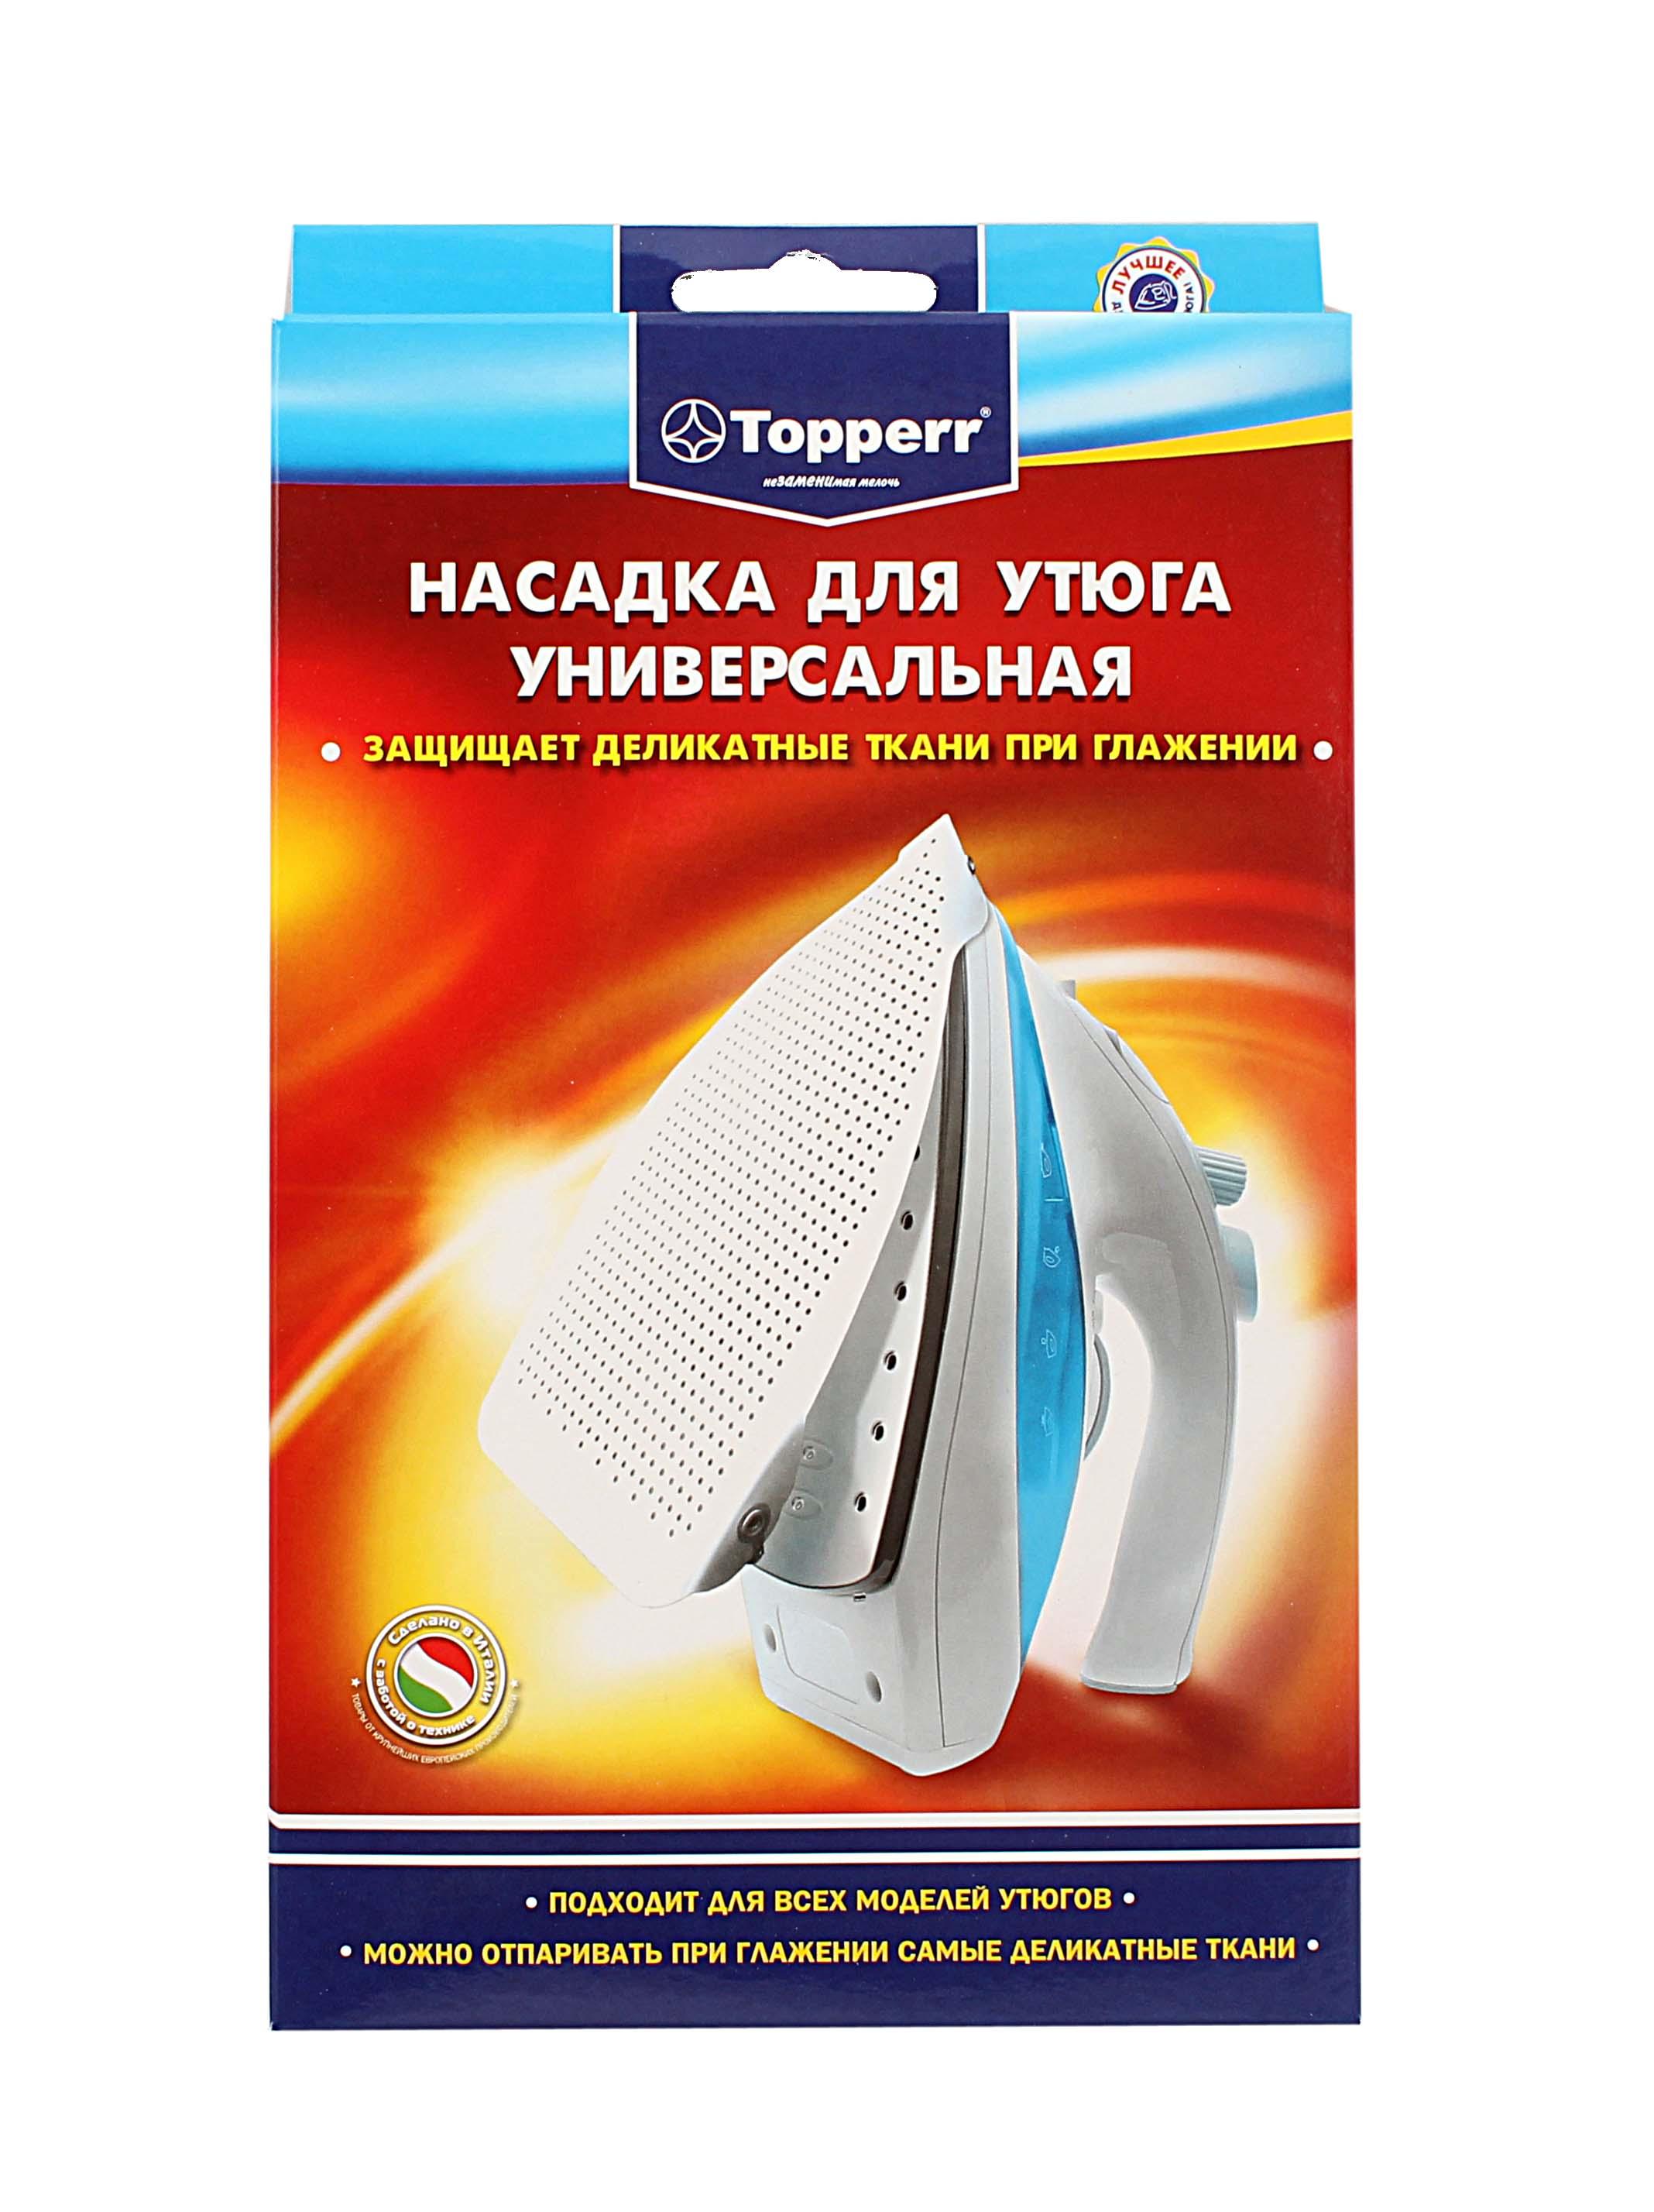 Аксессуары для утюгов Topperr Real Brand Technics 379.000